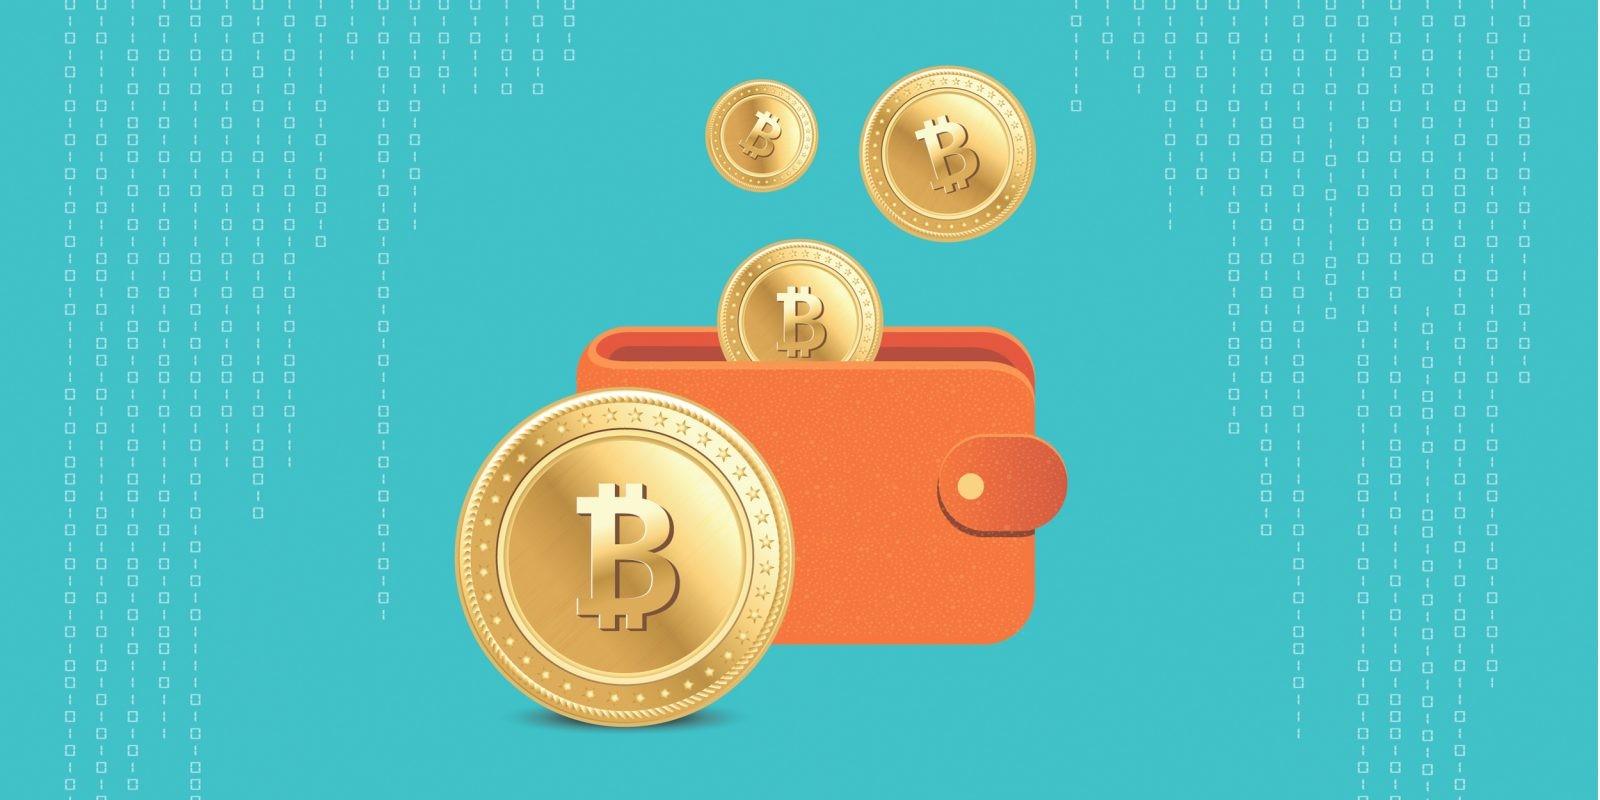 биткоин заработок без вложений на автомате